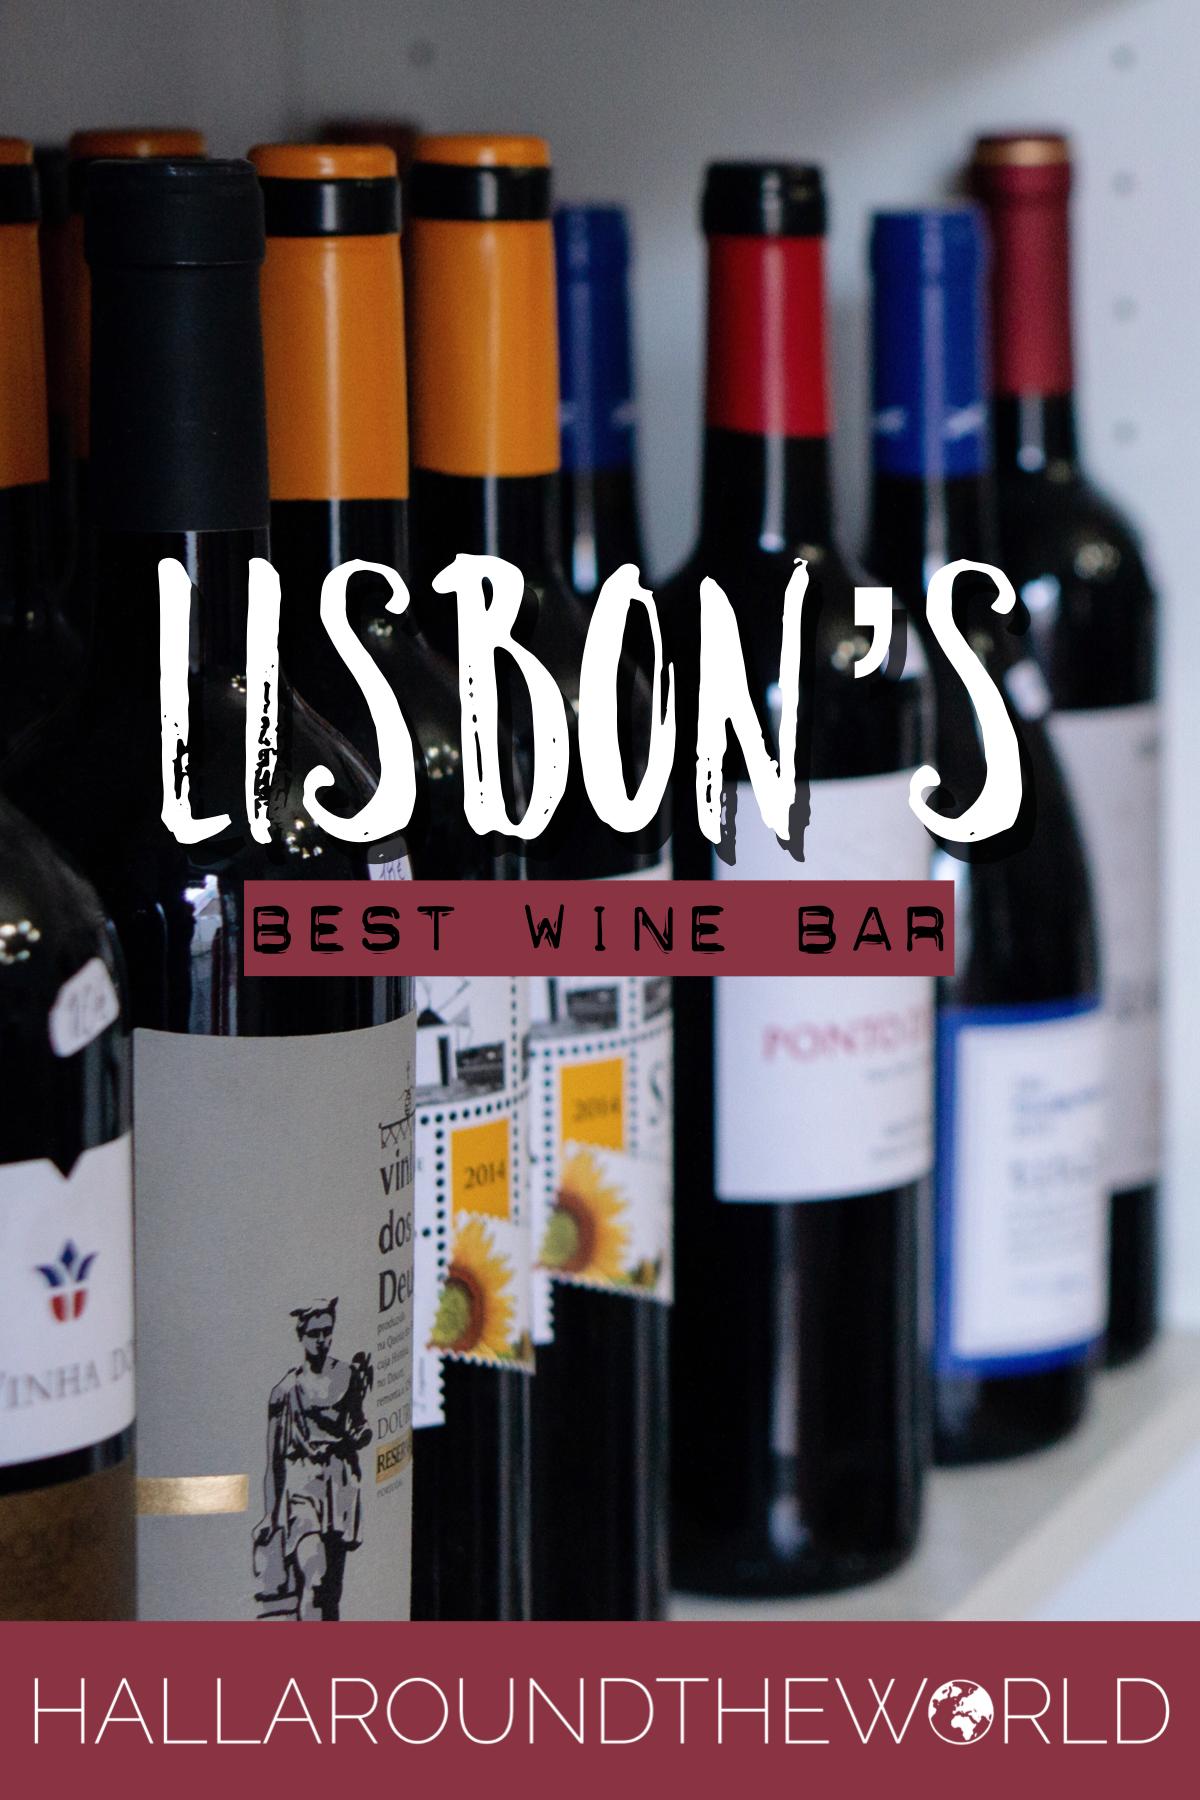 The Best Wine Bar in Lisbon, Portugal | HallAroundtheWorld